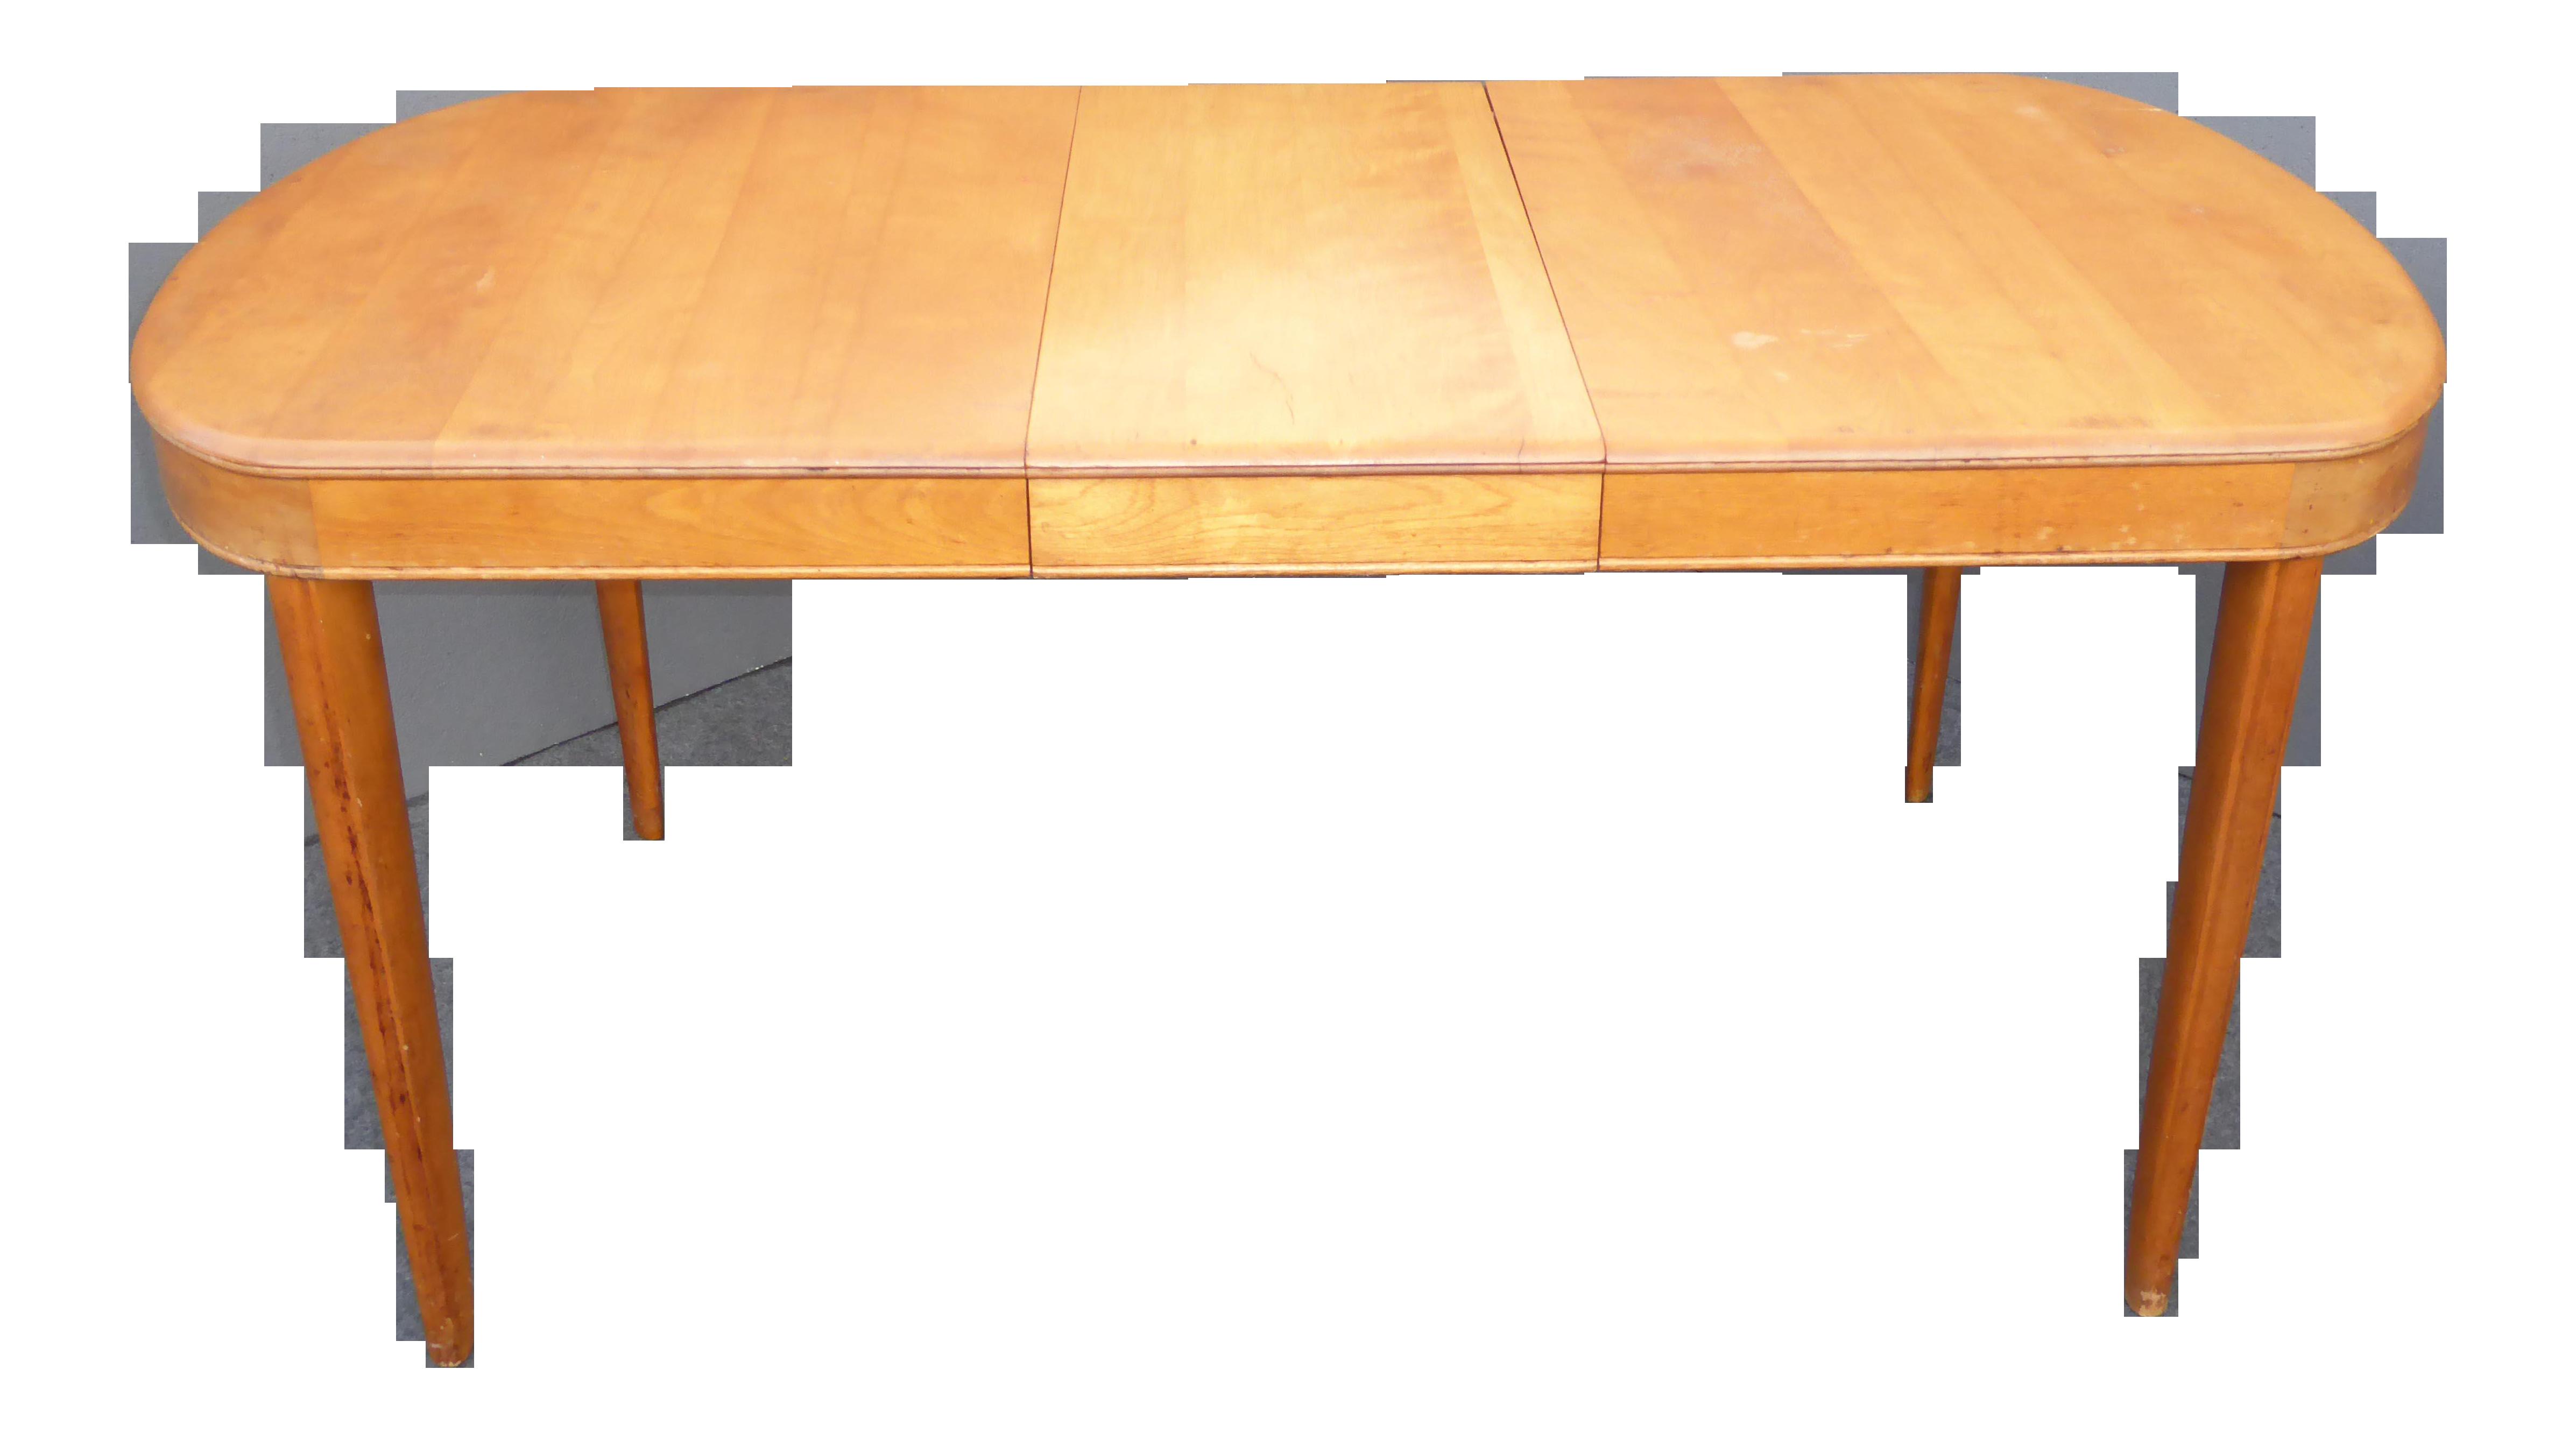 Vintage Heywood Wakefield Danish Modern Dining Table  : vintage heywood wakefield danish modern dining table 7718aspectfitampwidth640ampheight640 from www.chairish.com size 640 x 640 jpeg 21kB